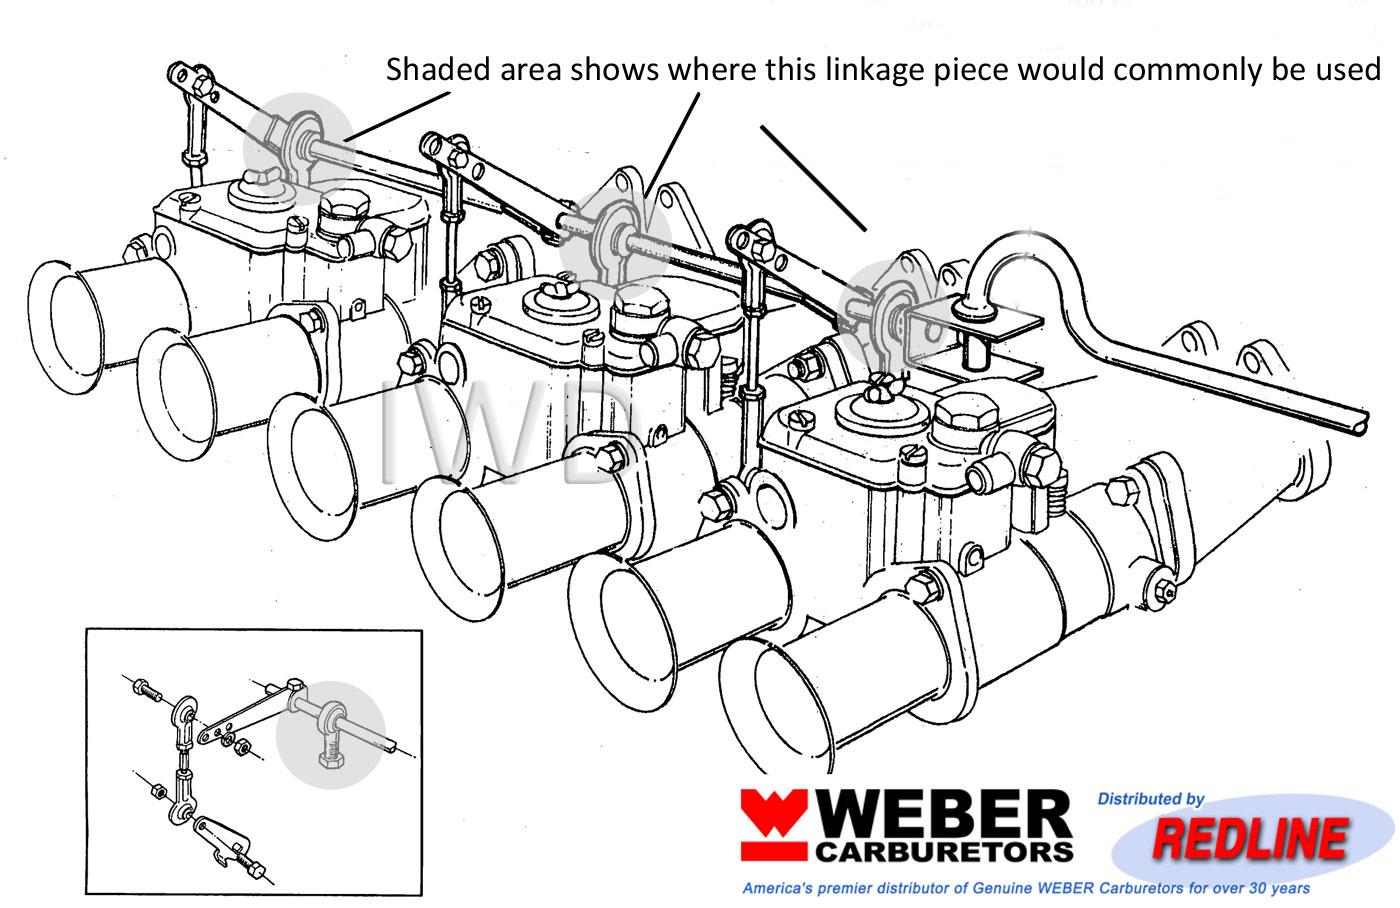 35 Hp Kawasaki Mower Engines additionally Bluebird Wiring Diagrams likewise Edelbrock Chrome Single Feed Fuel Line Kit Ed8126 as well Kawasaki Lawn Mower Engine Diagram Linkage Chokr together with Cables. on custom carburetor linkage